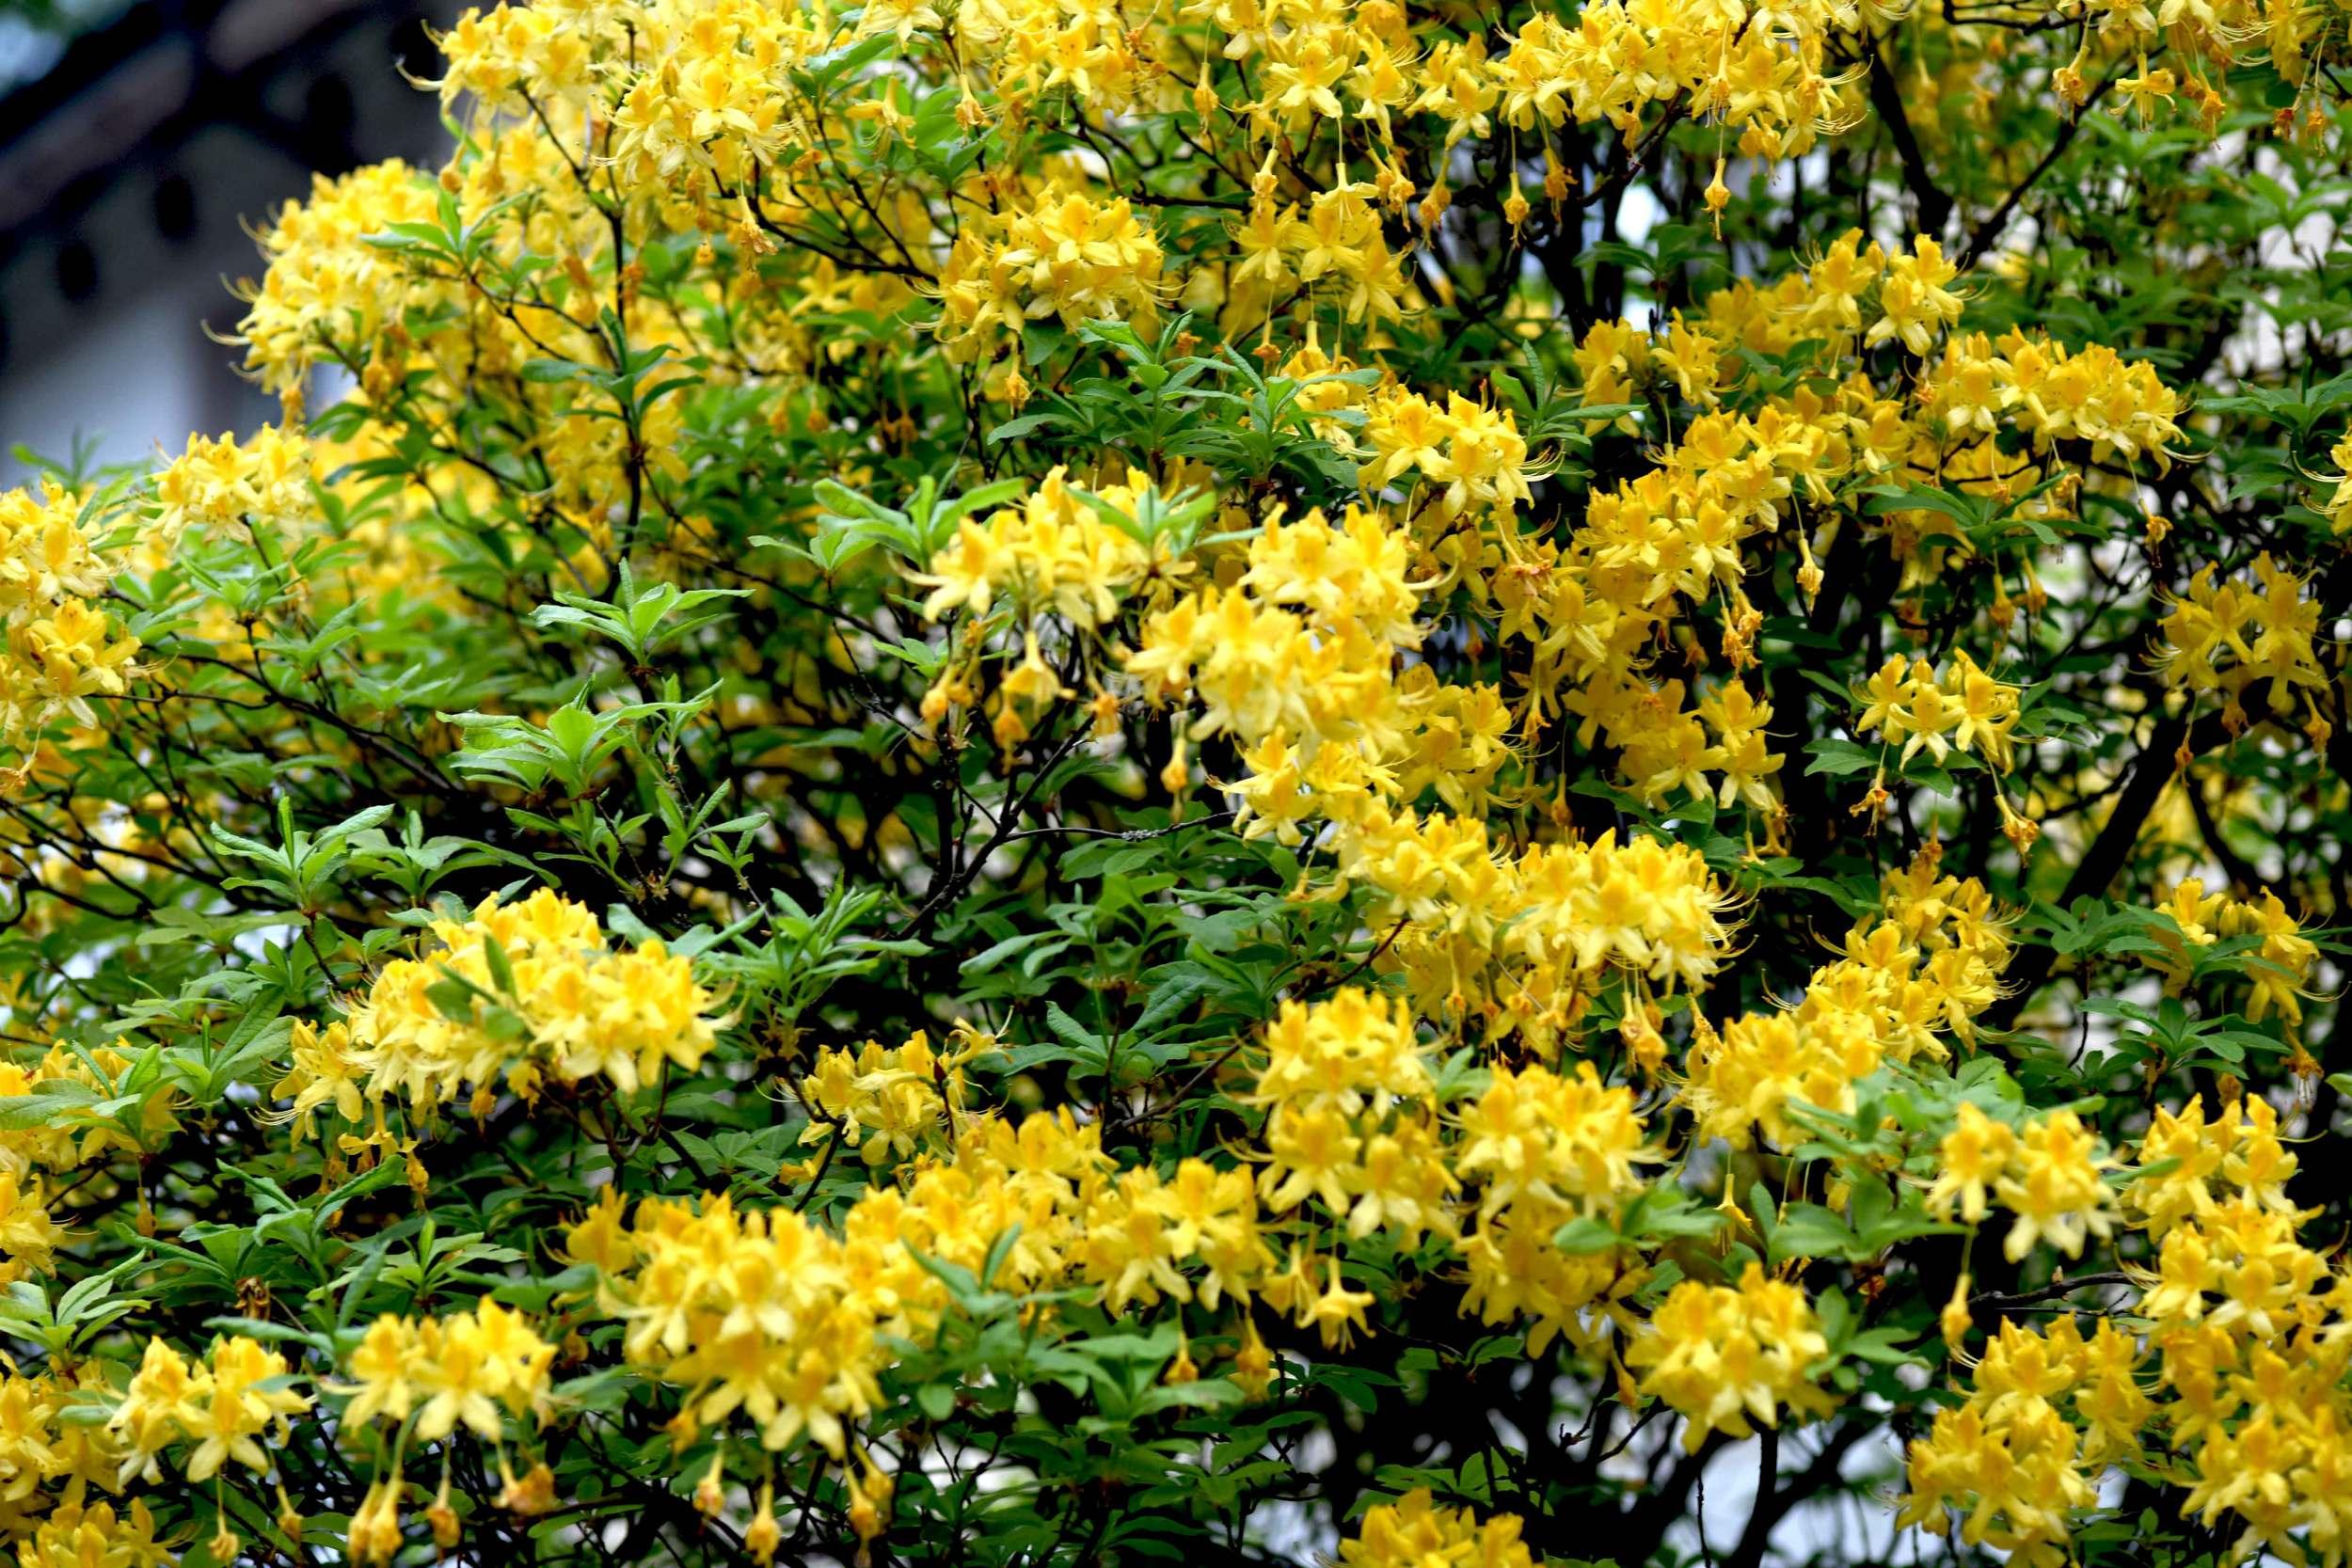 yellow spring blossoms, spring flowers, Lichtentaler Allee, Baden Baden, Germany. Image©sourcingstyle.com